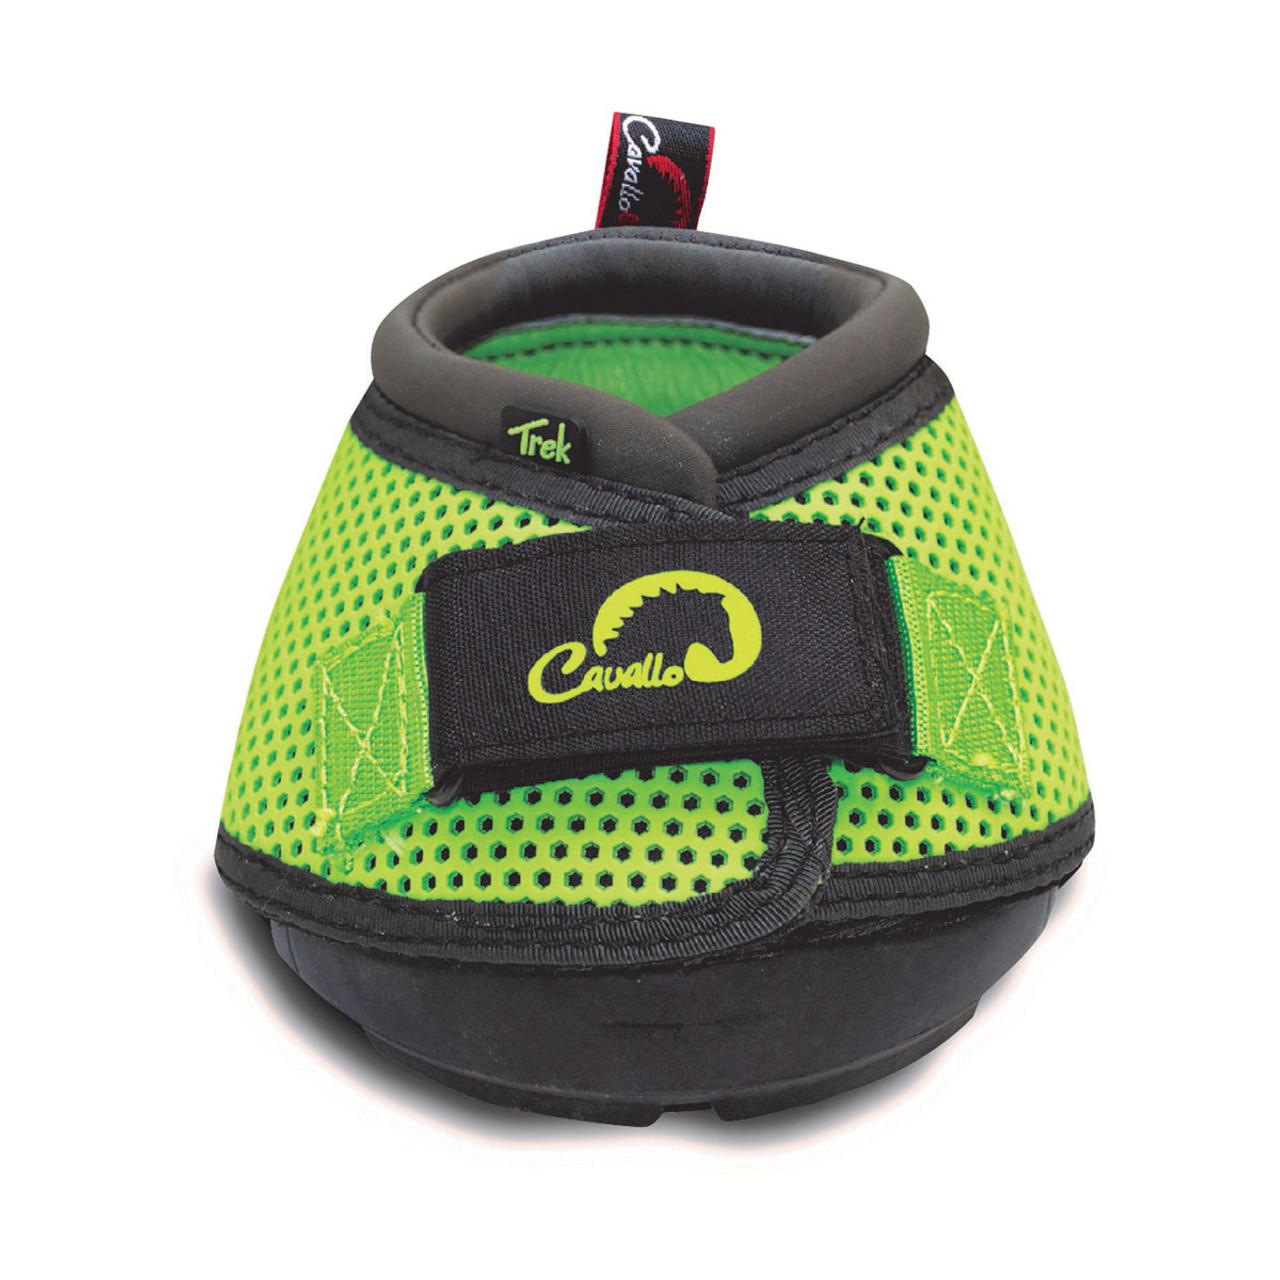 Cavallo Trek Green (single boot)